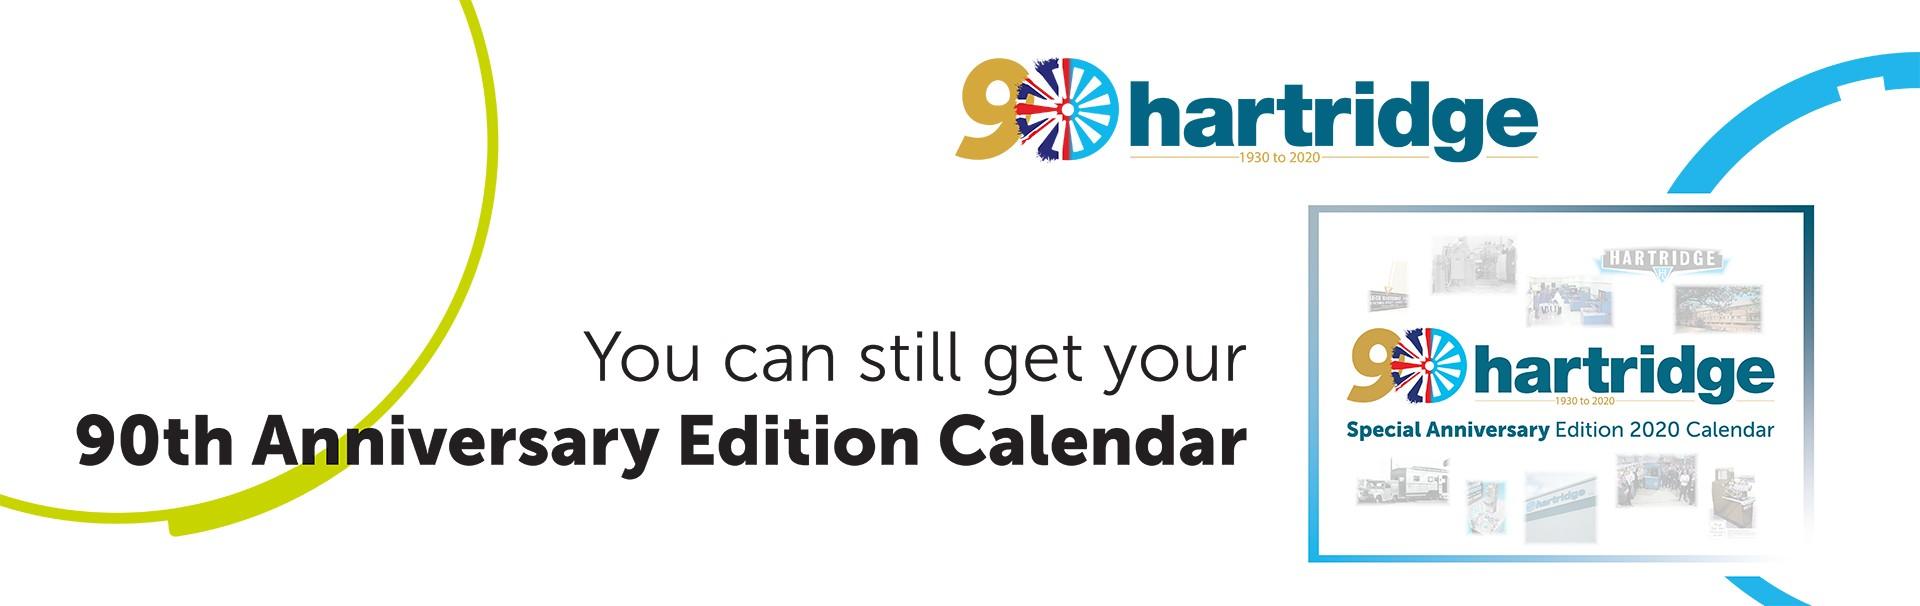 <p><a href='https://www.hartridge.shop/shop/calibration-fluid/90th-anniversary-calendar/'>More Details</a></p>